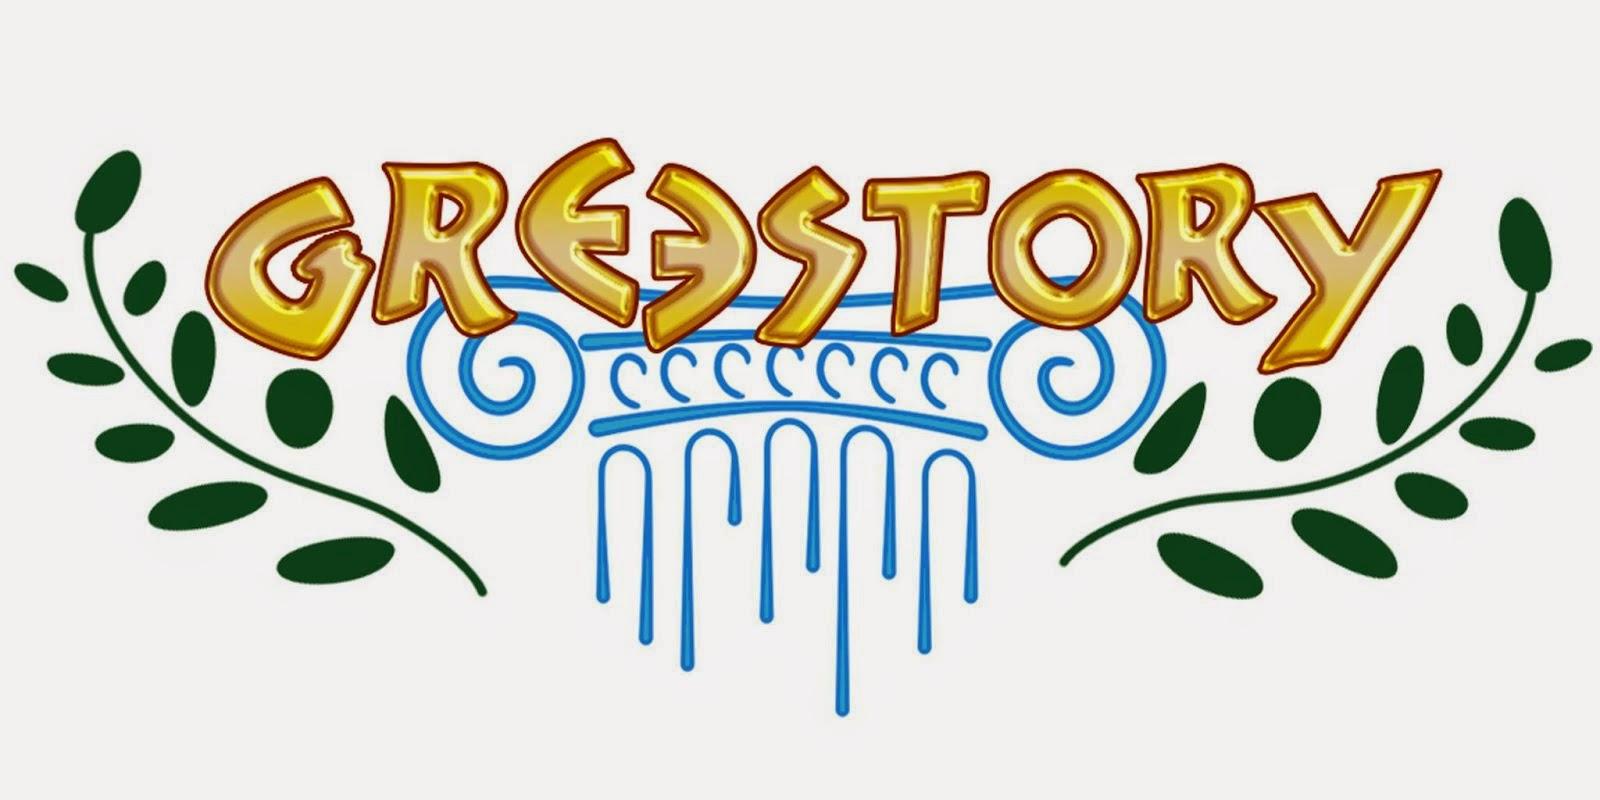 Greestory